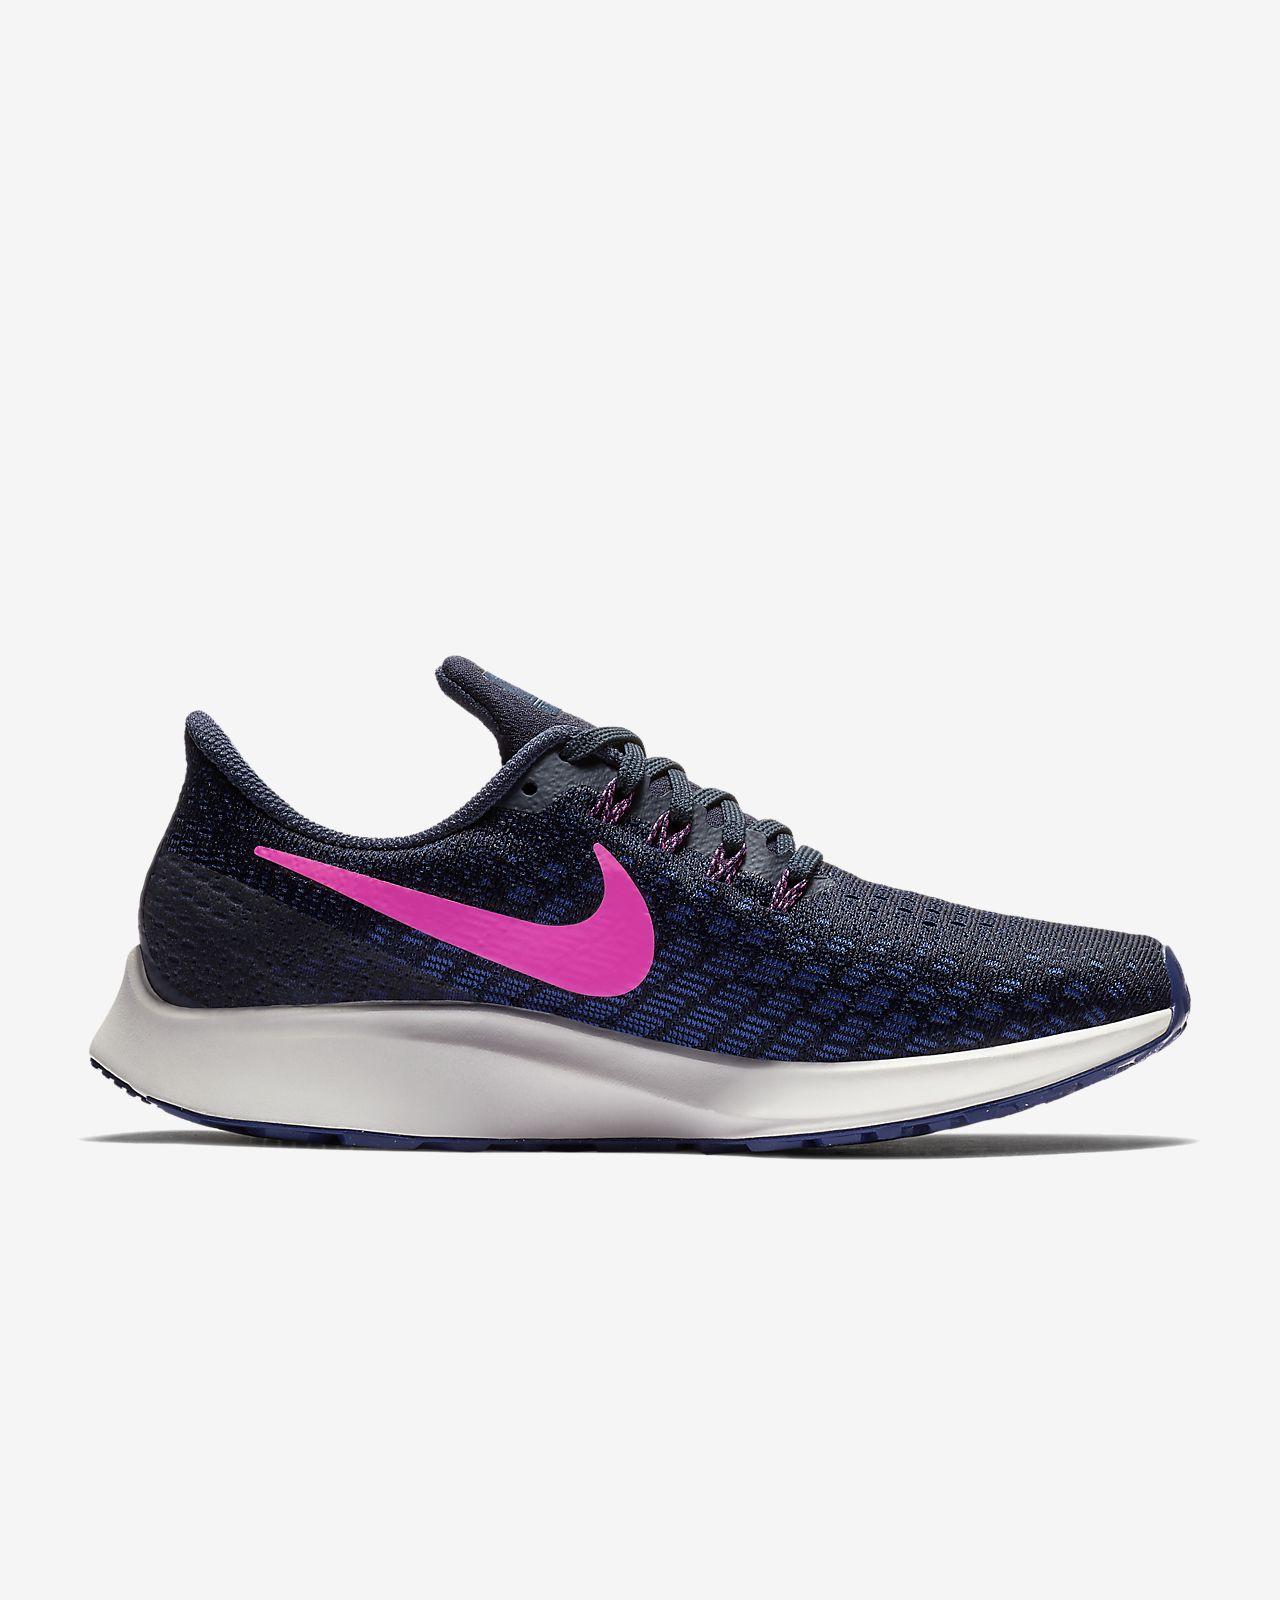 the best attitude d7e9d d3a39 ... Nike Air Zoom Pegasus 35 Women s Running Shoe